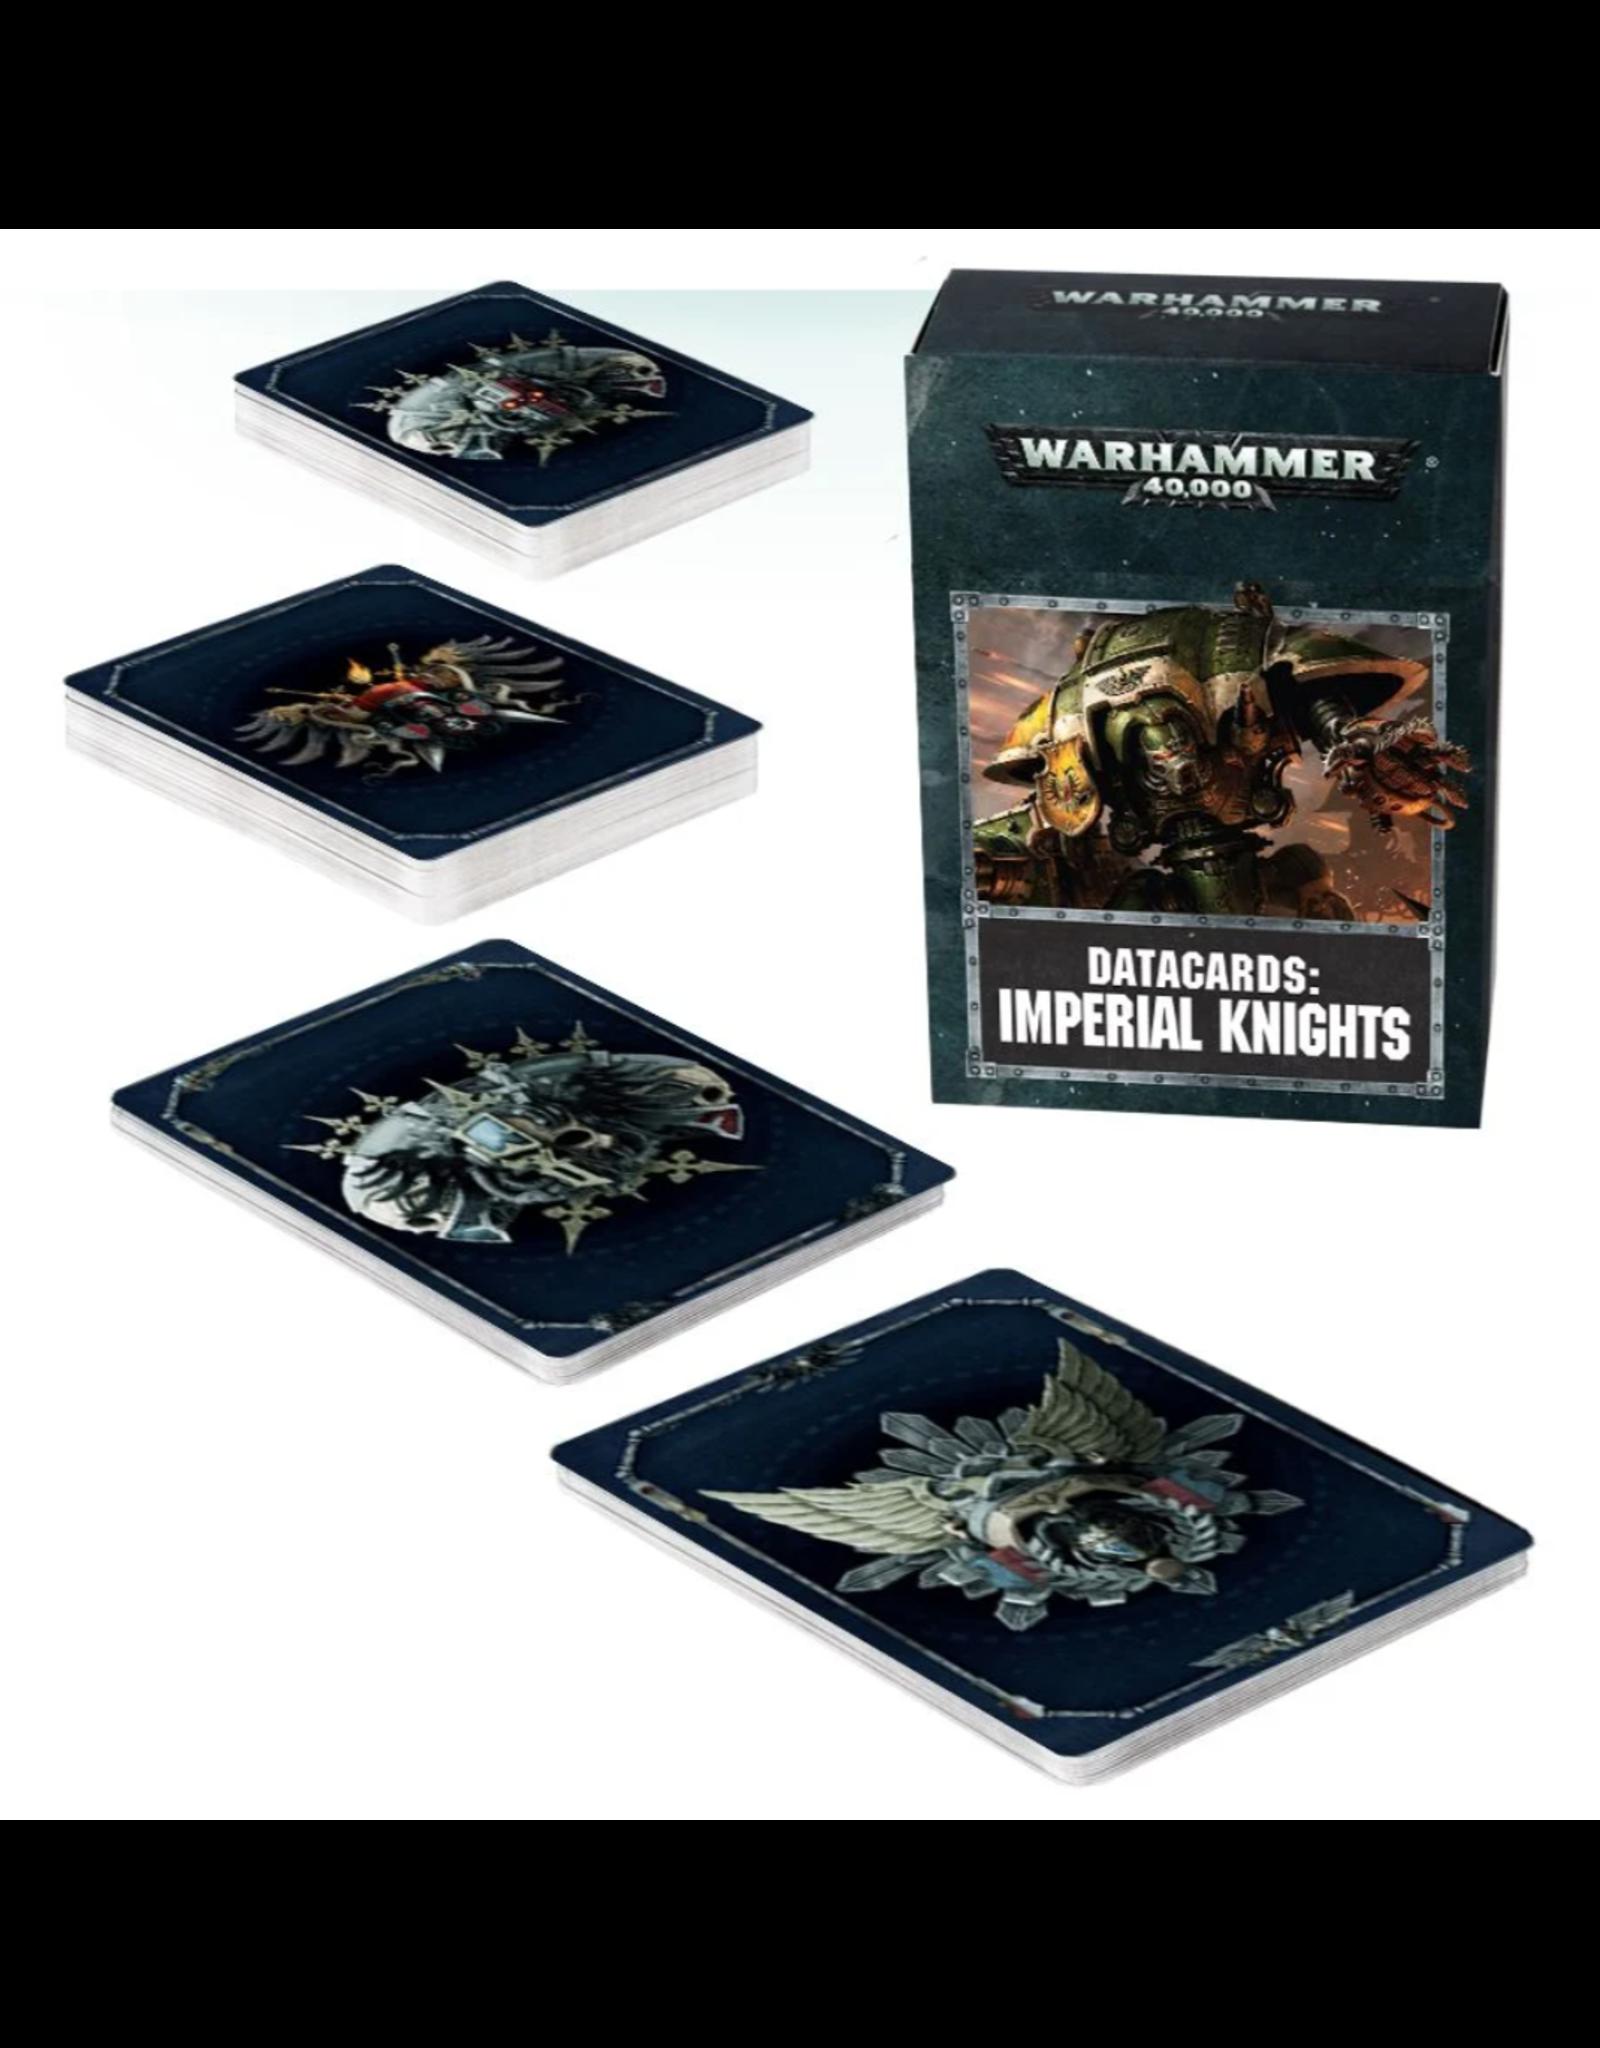 Warhammer 40K Datacards: Imperial Knights